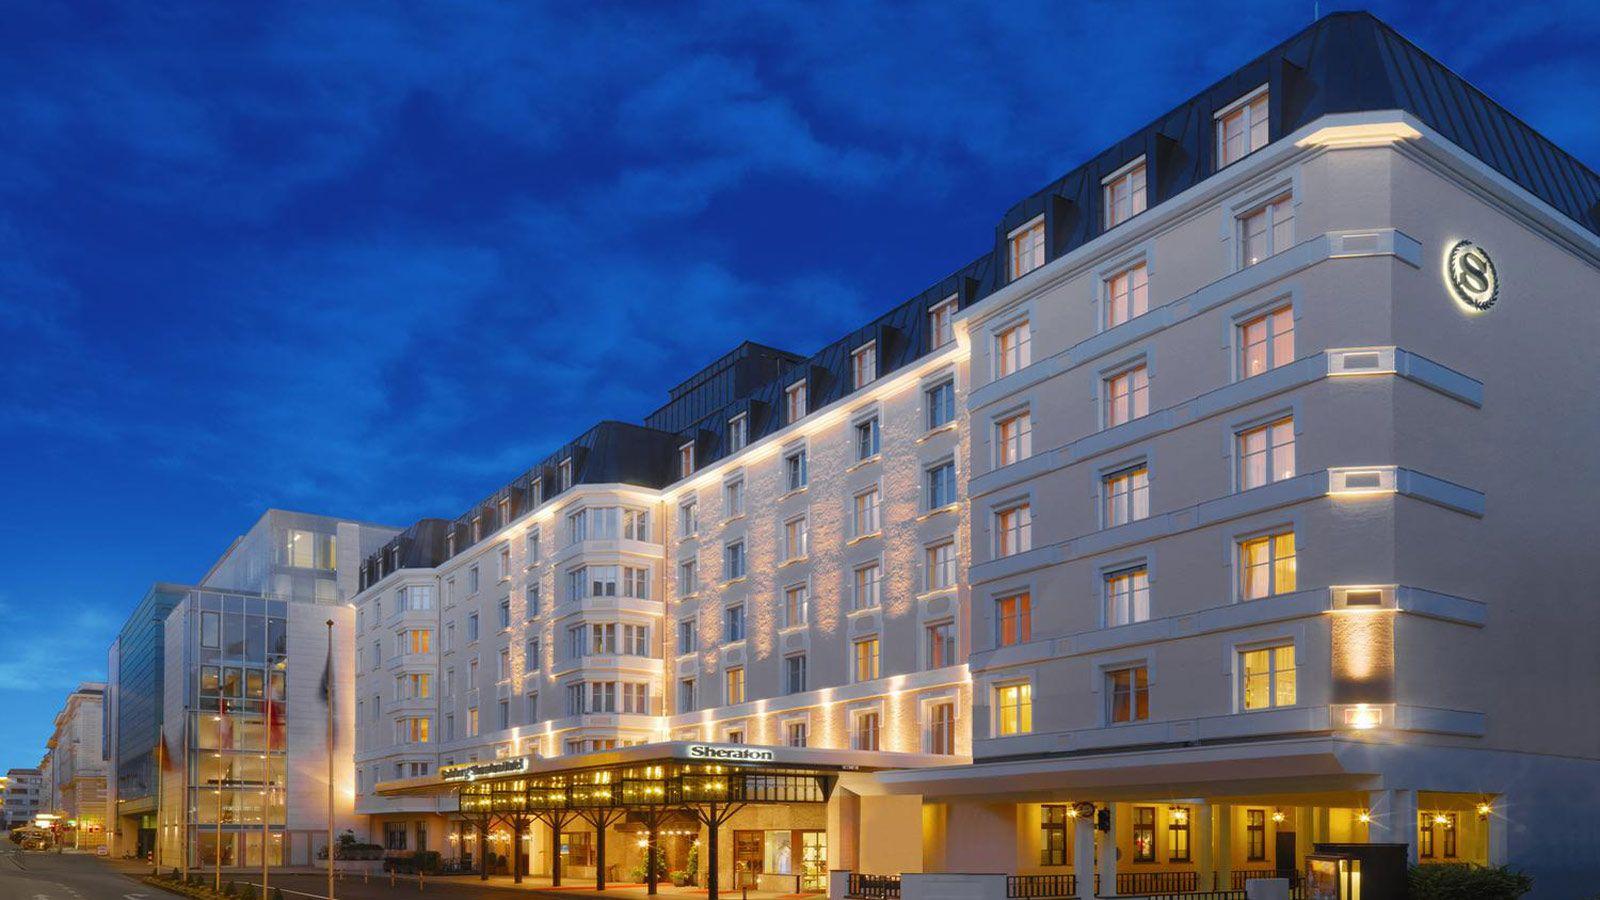 sheraton-salzburg-hotel